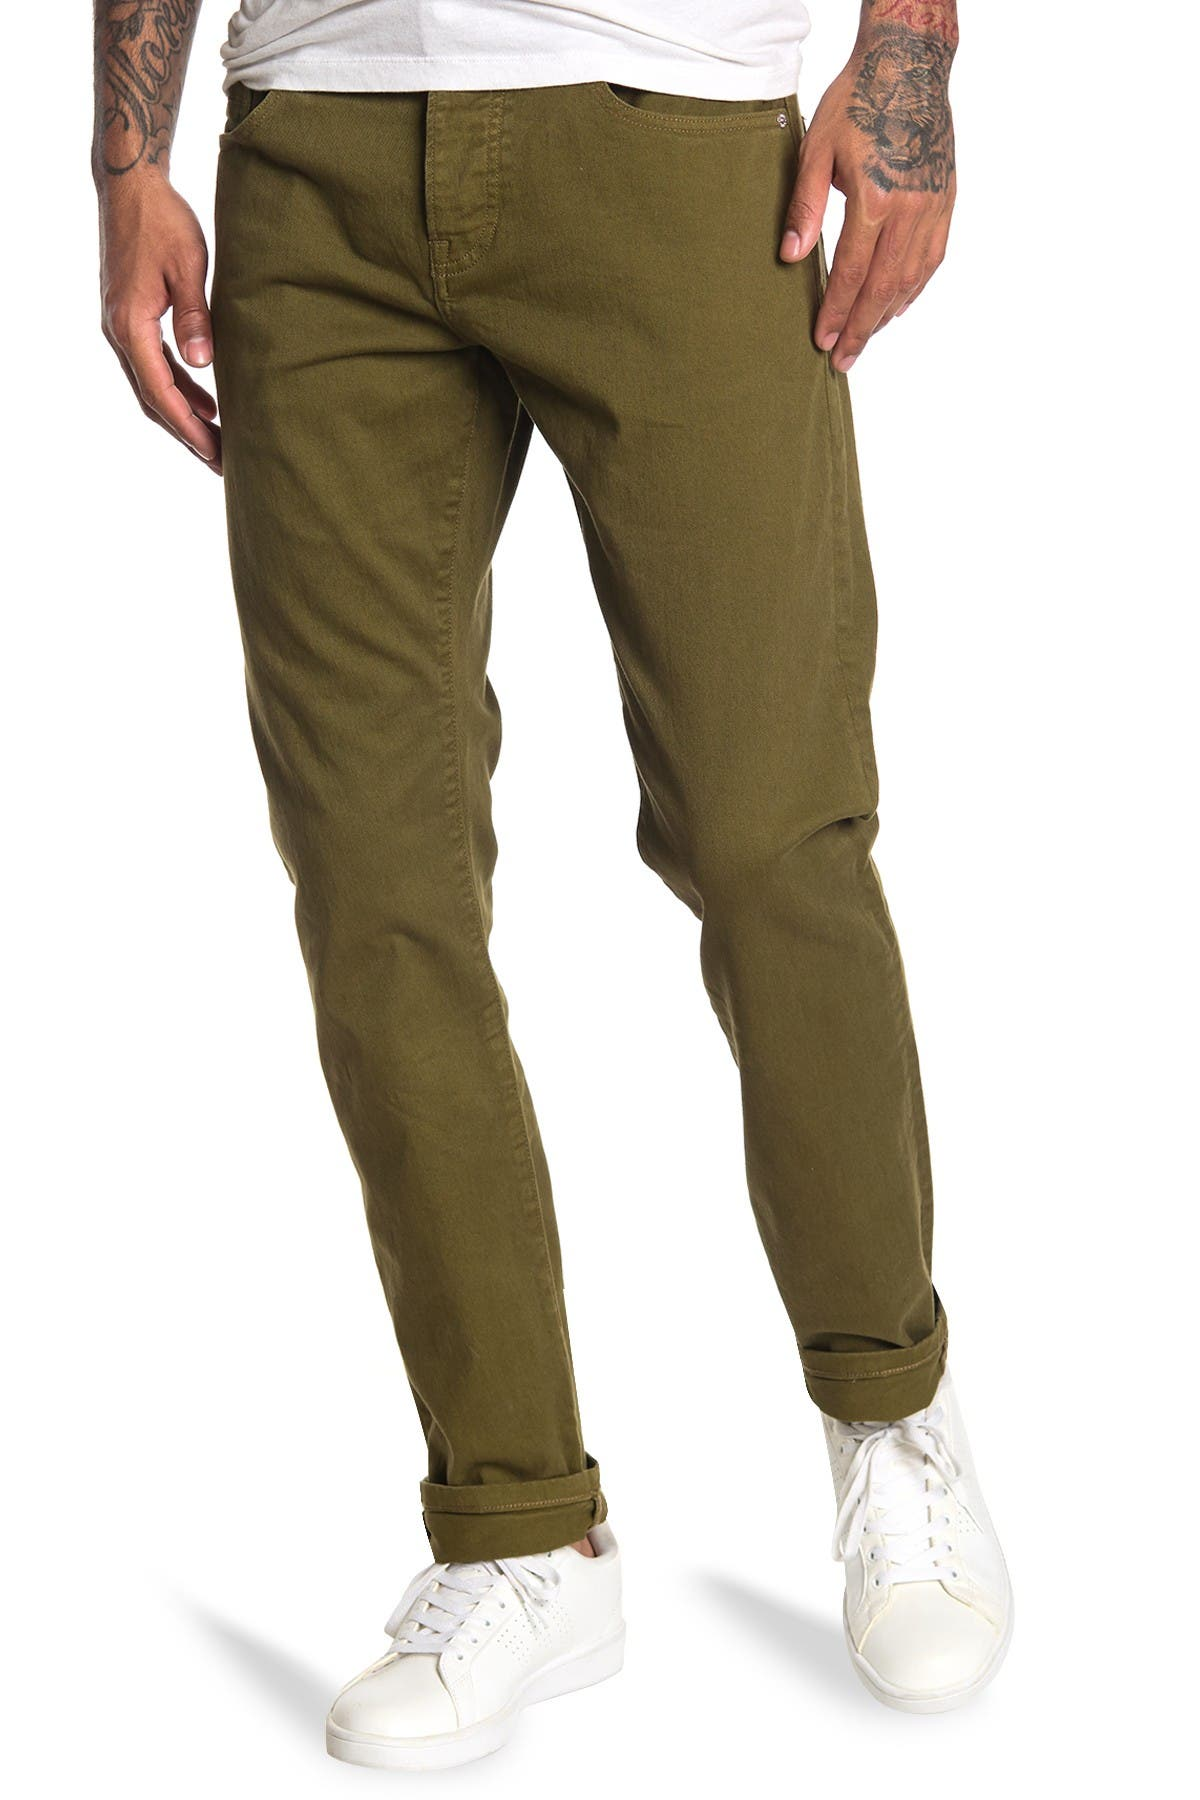 Image of Scotch & Soda Ralston Dyed Denim Jeans